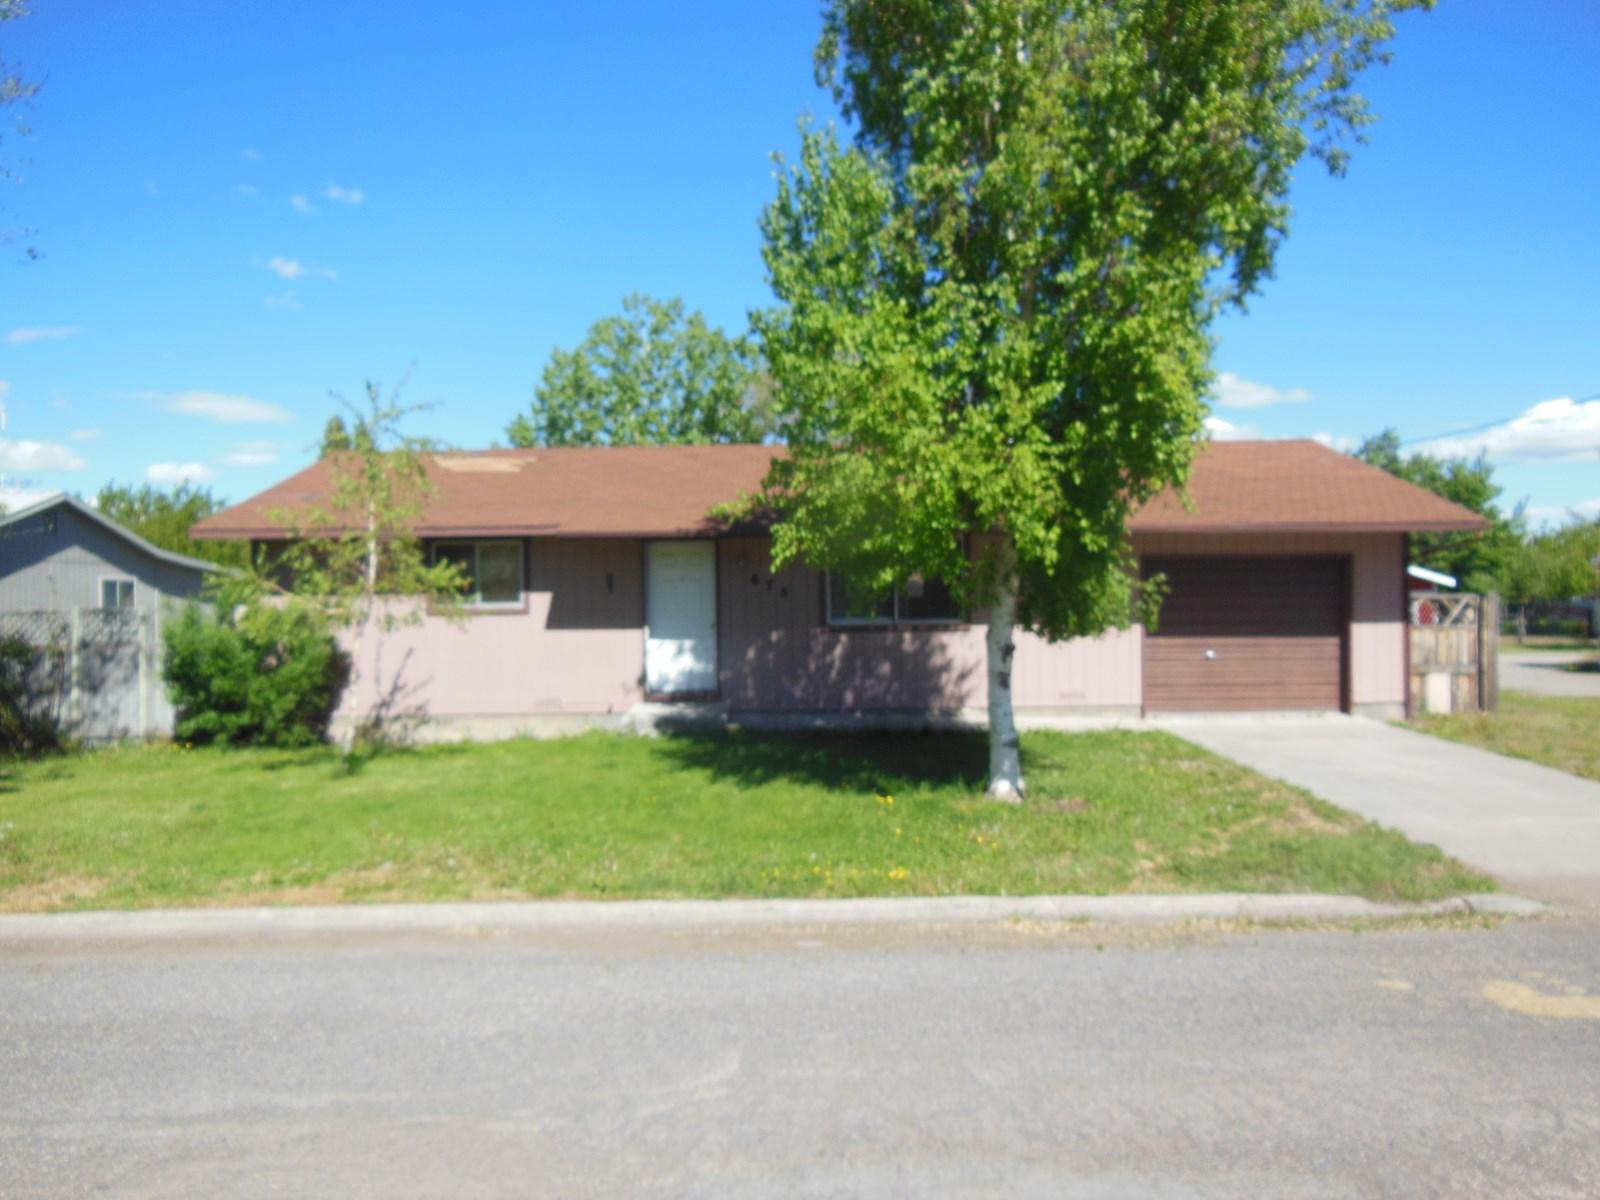 3 bdr/2bath 1,200 sq. ft Ranch Style home w/2-car garage